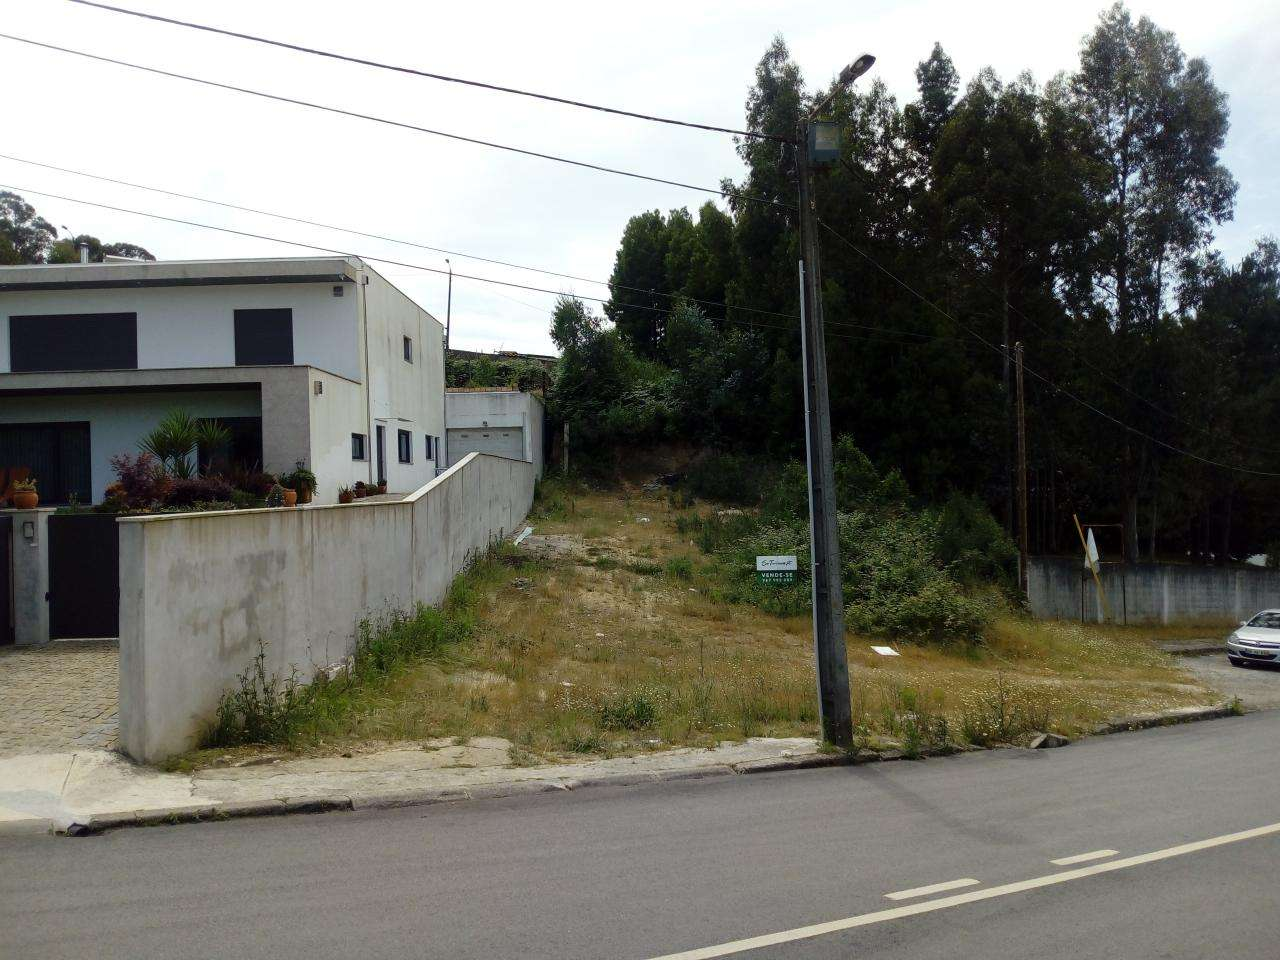 Terreno para comprar, Santa Maria da Feira, Travanca, Sanfins e Espargo, Aveiro - Foto 3